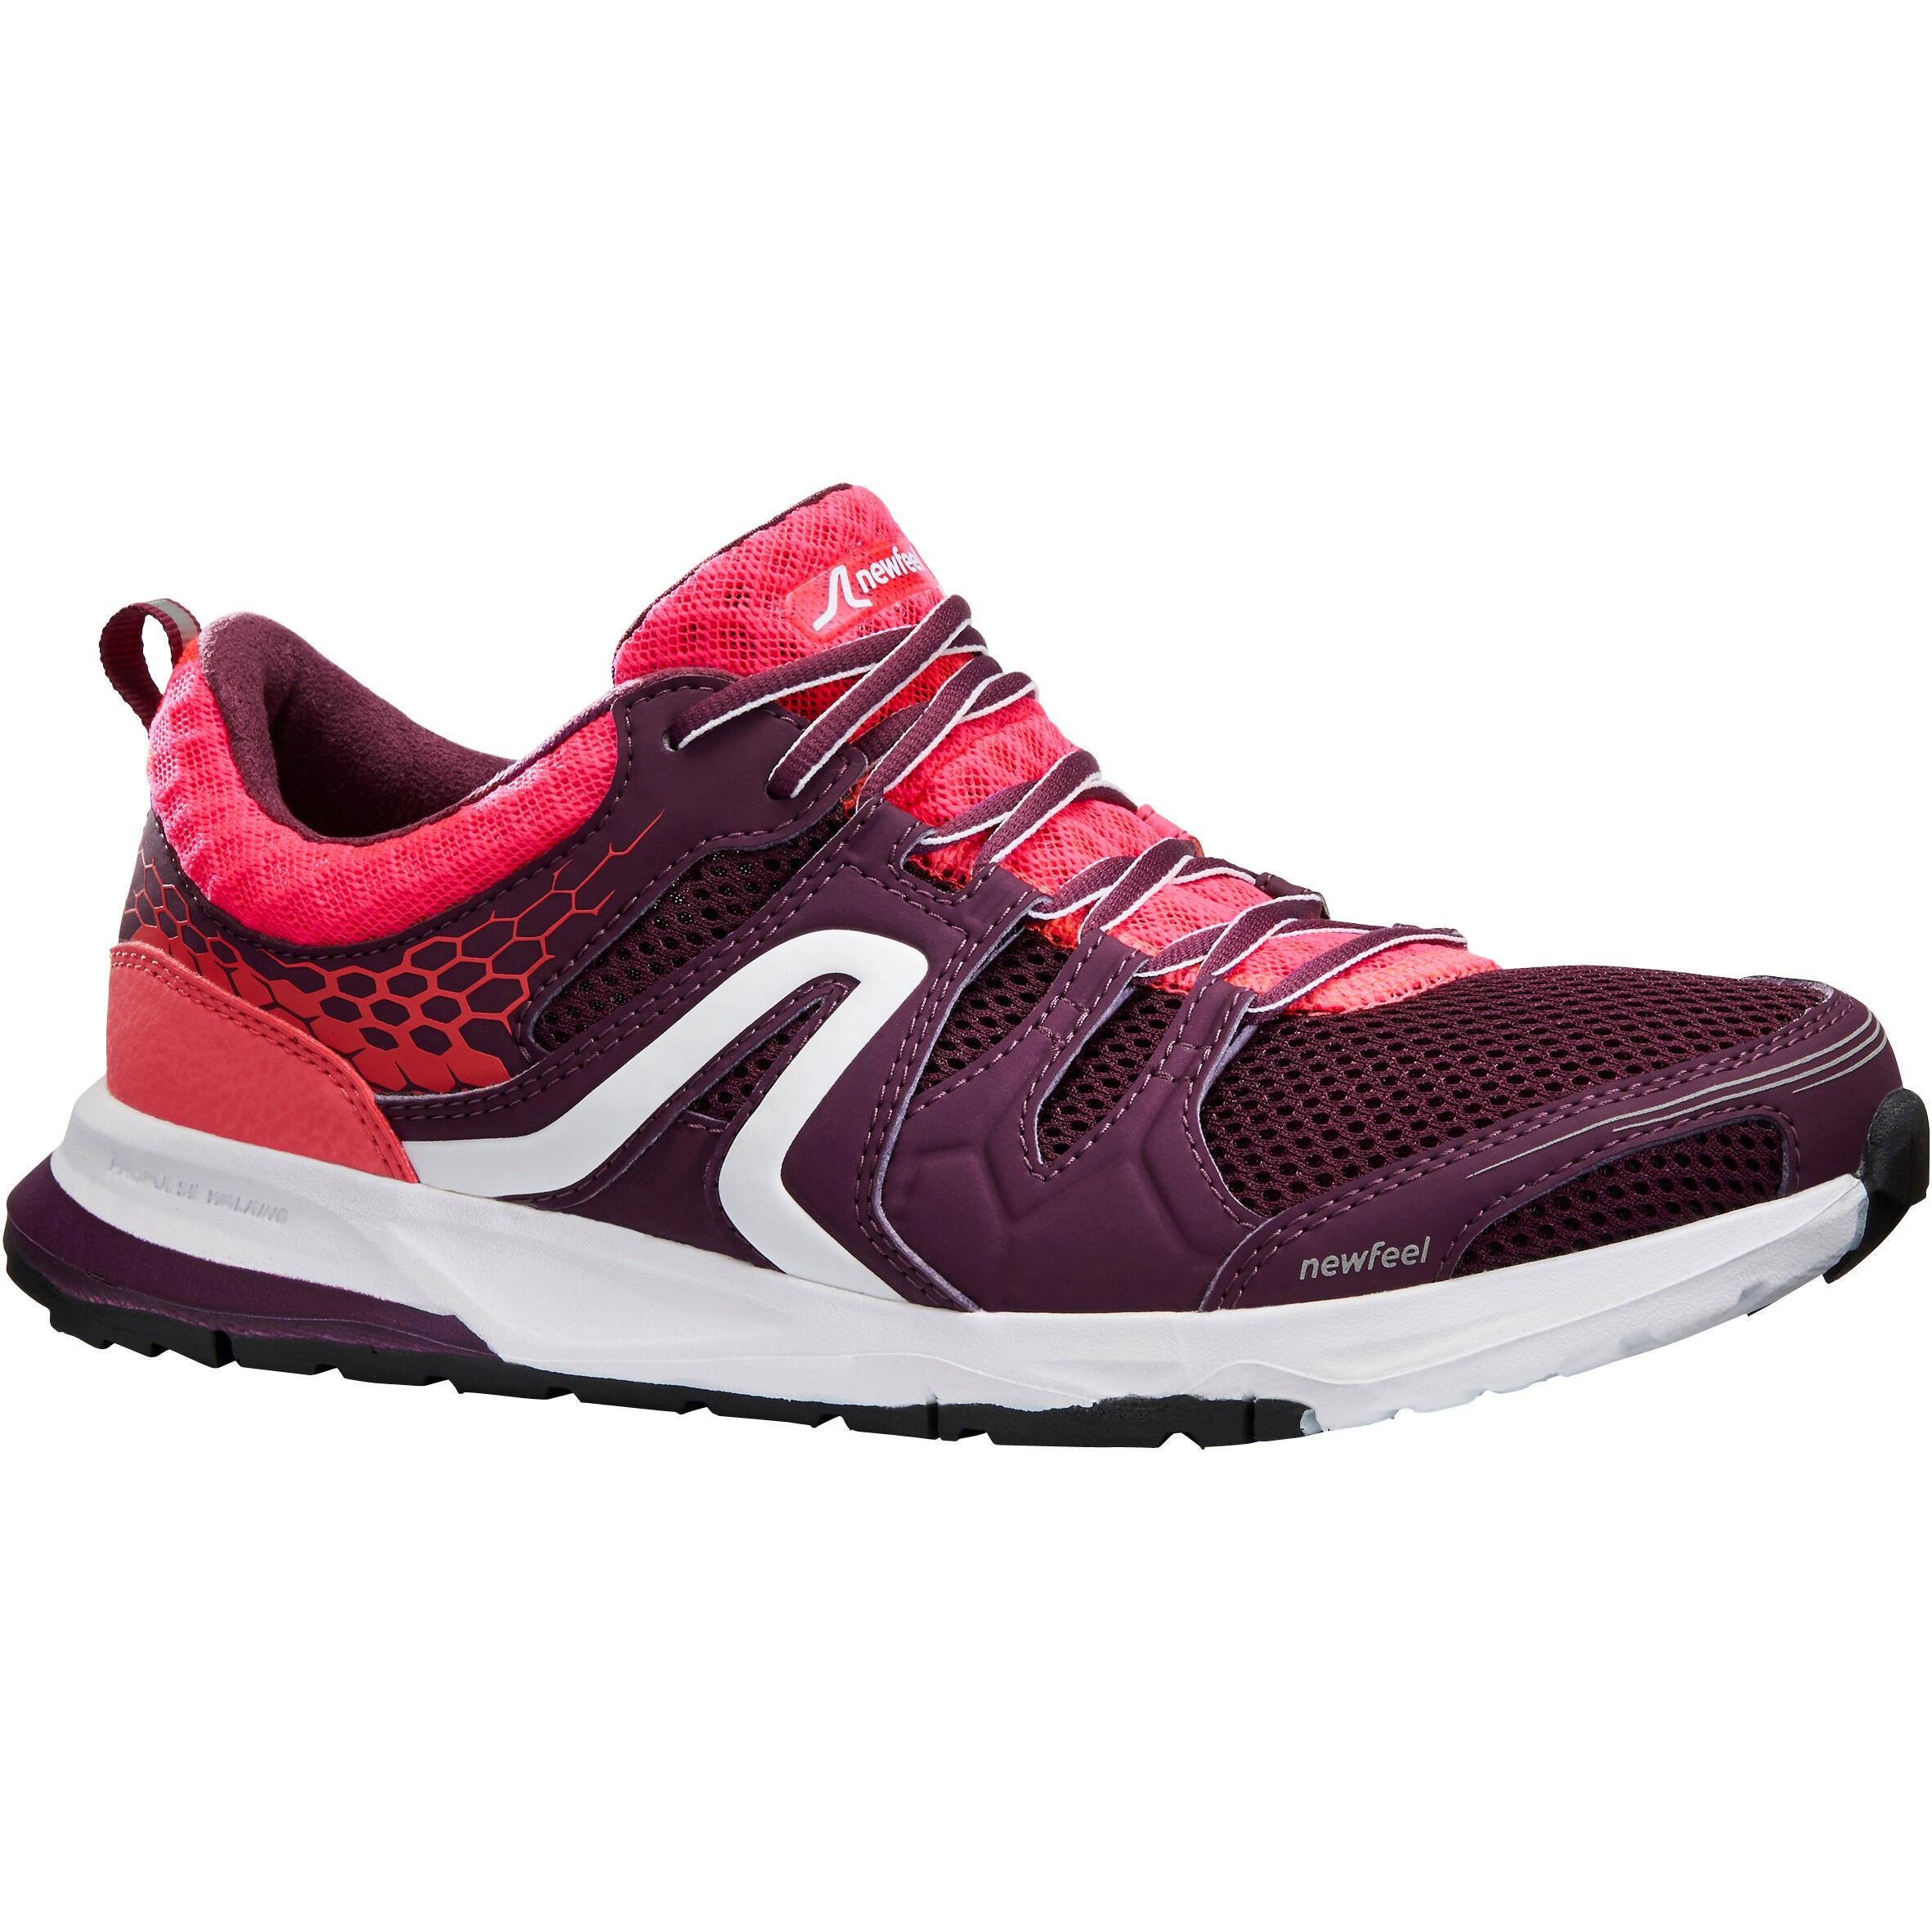 Walkingschuhe athletisches Gehen PW 240 Damen lila/rosa | Schuhe > Sportschuhe > Walkingschuhe | Violett - Rot - Rosa - Weiß | Newfeel